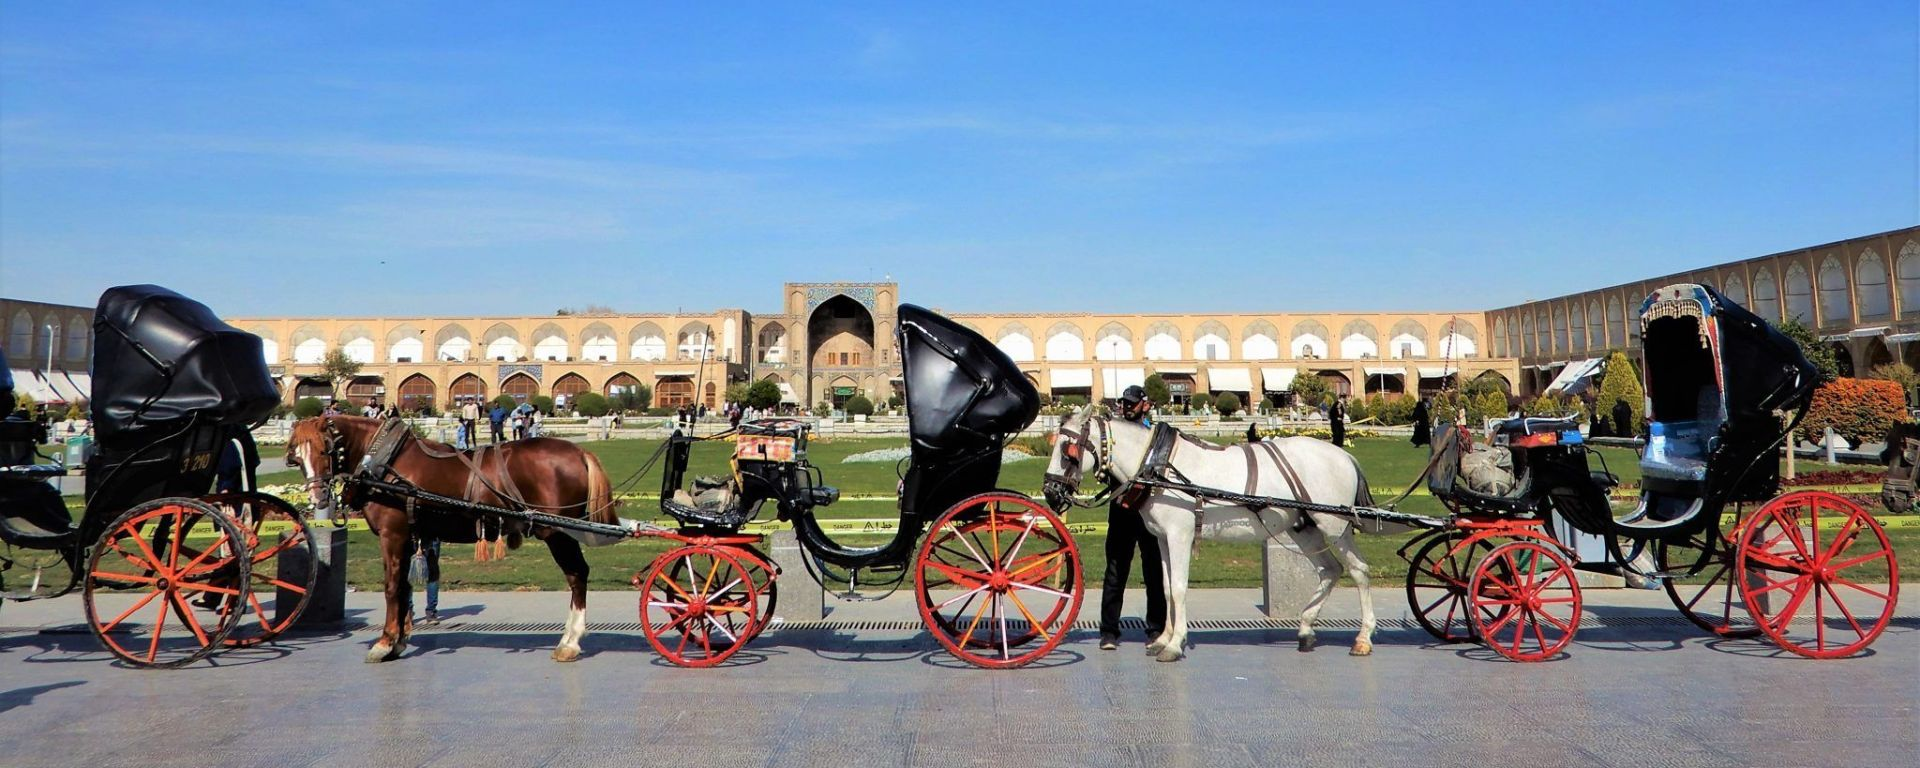 Carrueajes en Naghsh-i Jahan, Isfahan, Iran